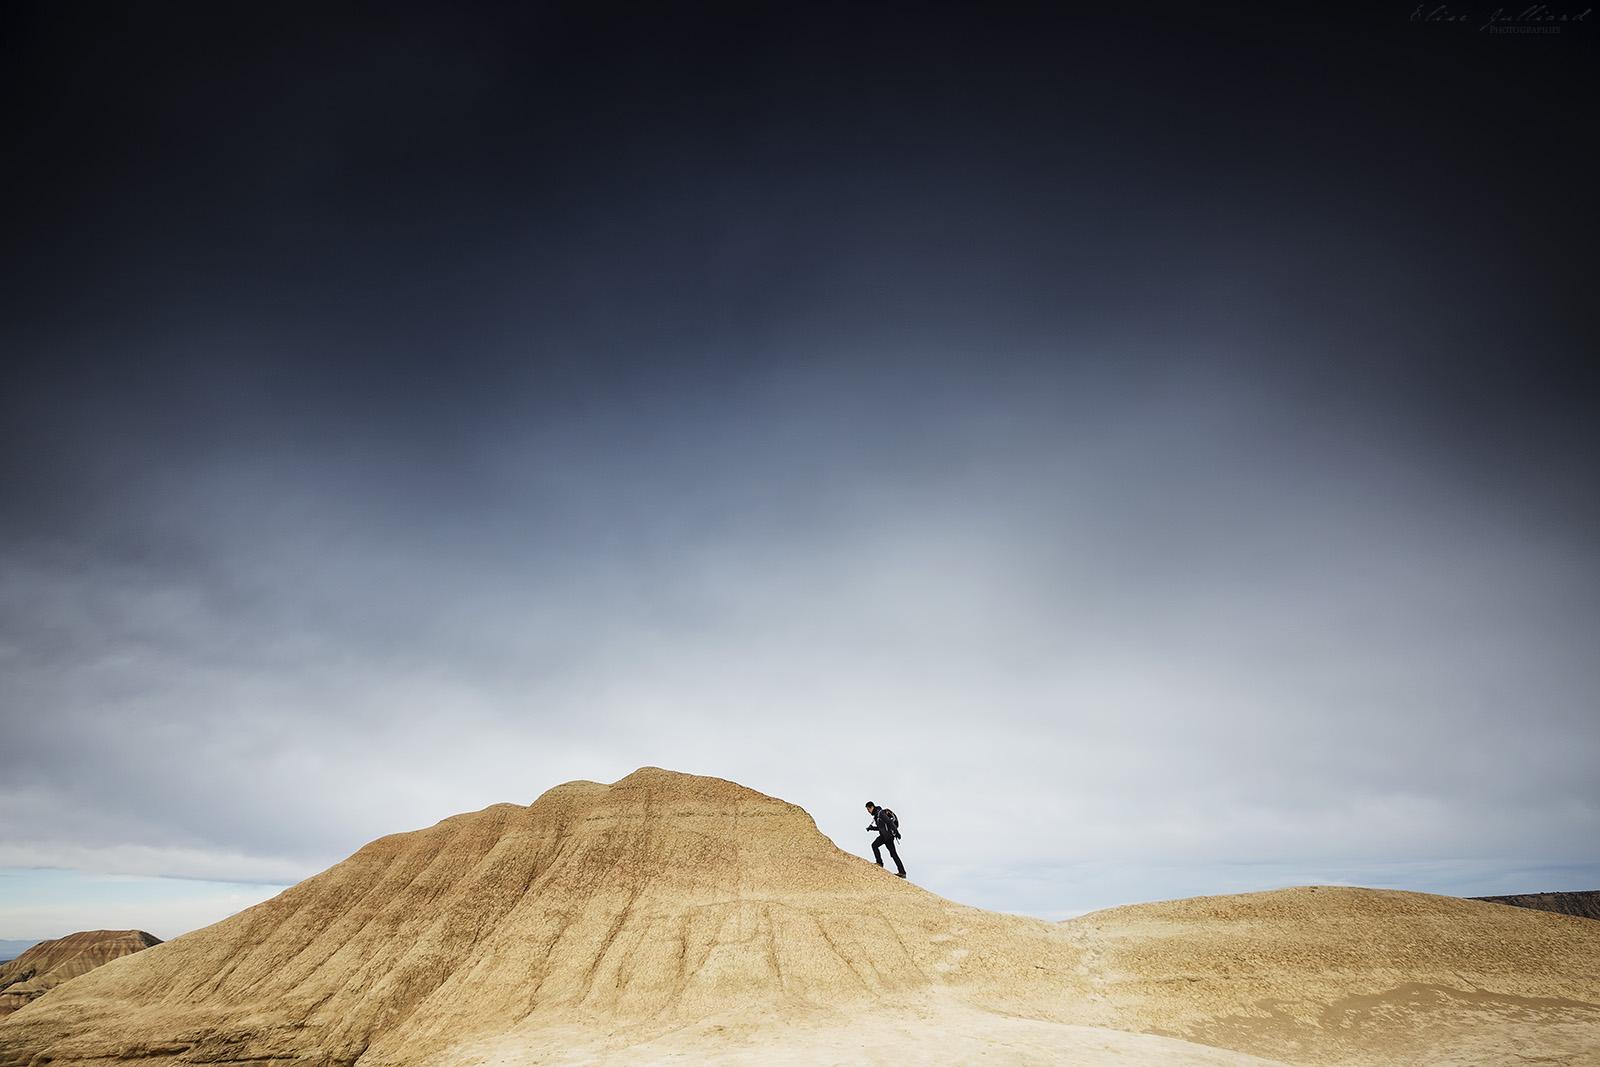 elise-julliard-photographe-lyon-voyage-roadtrip-travel-espagne-aventures-journal-portrait-tudela-bardenas-reales-navarre-arguedas-desert